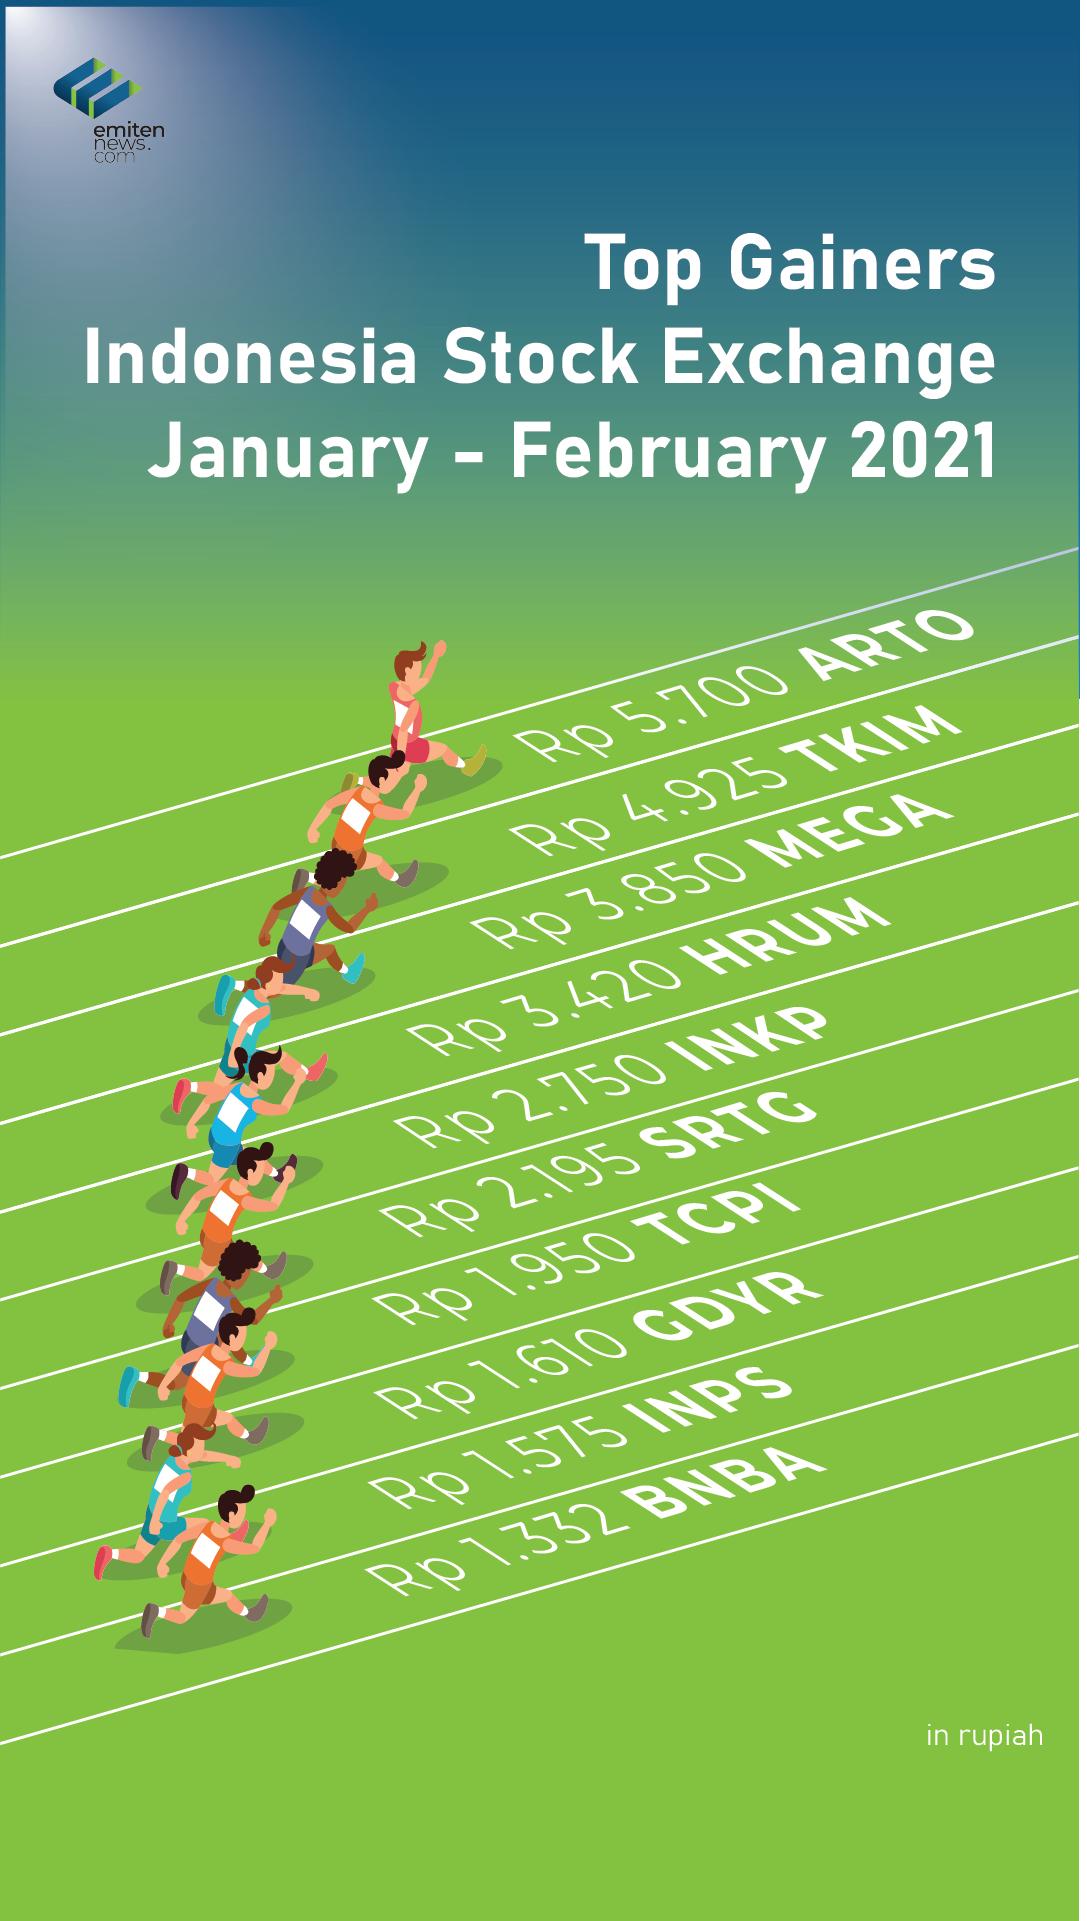 Top Gainers IDX January - February 2021